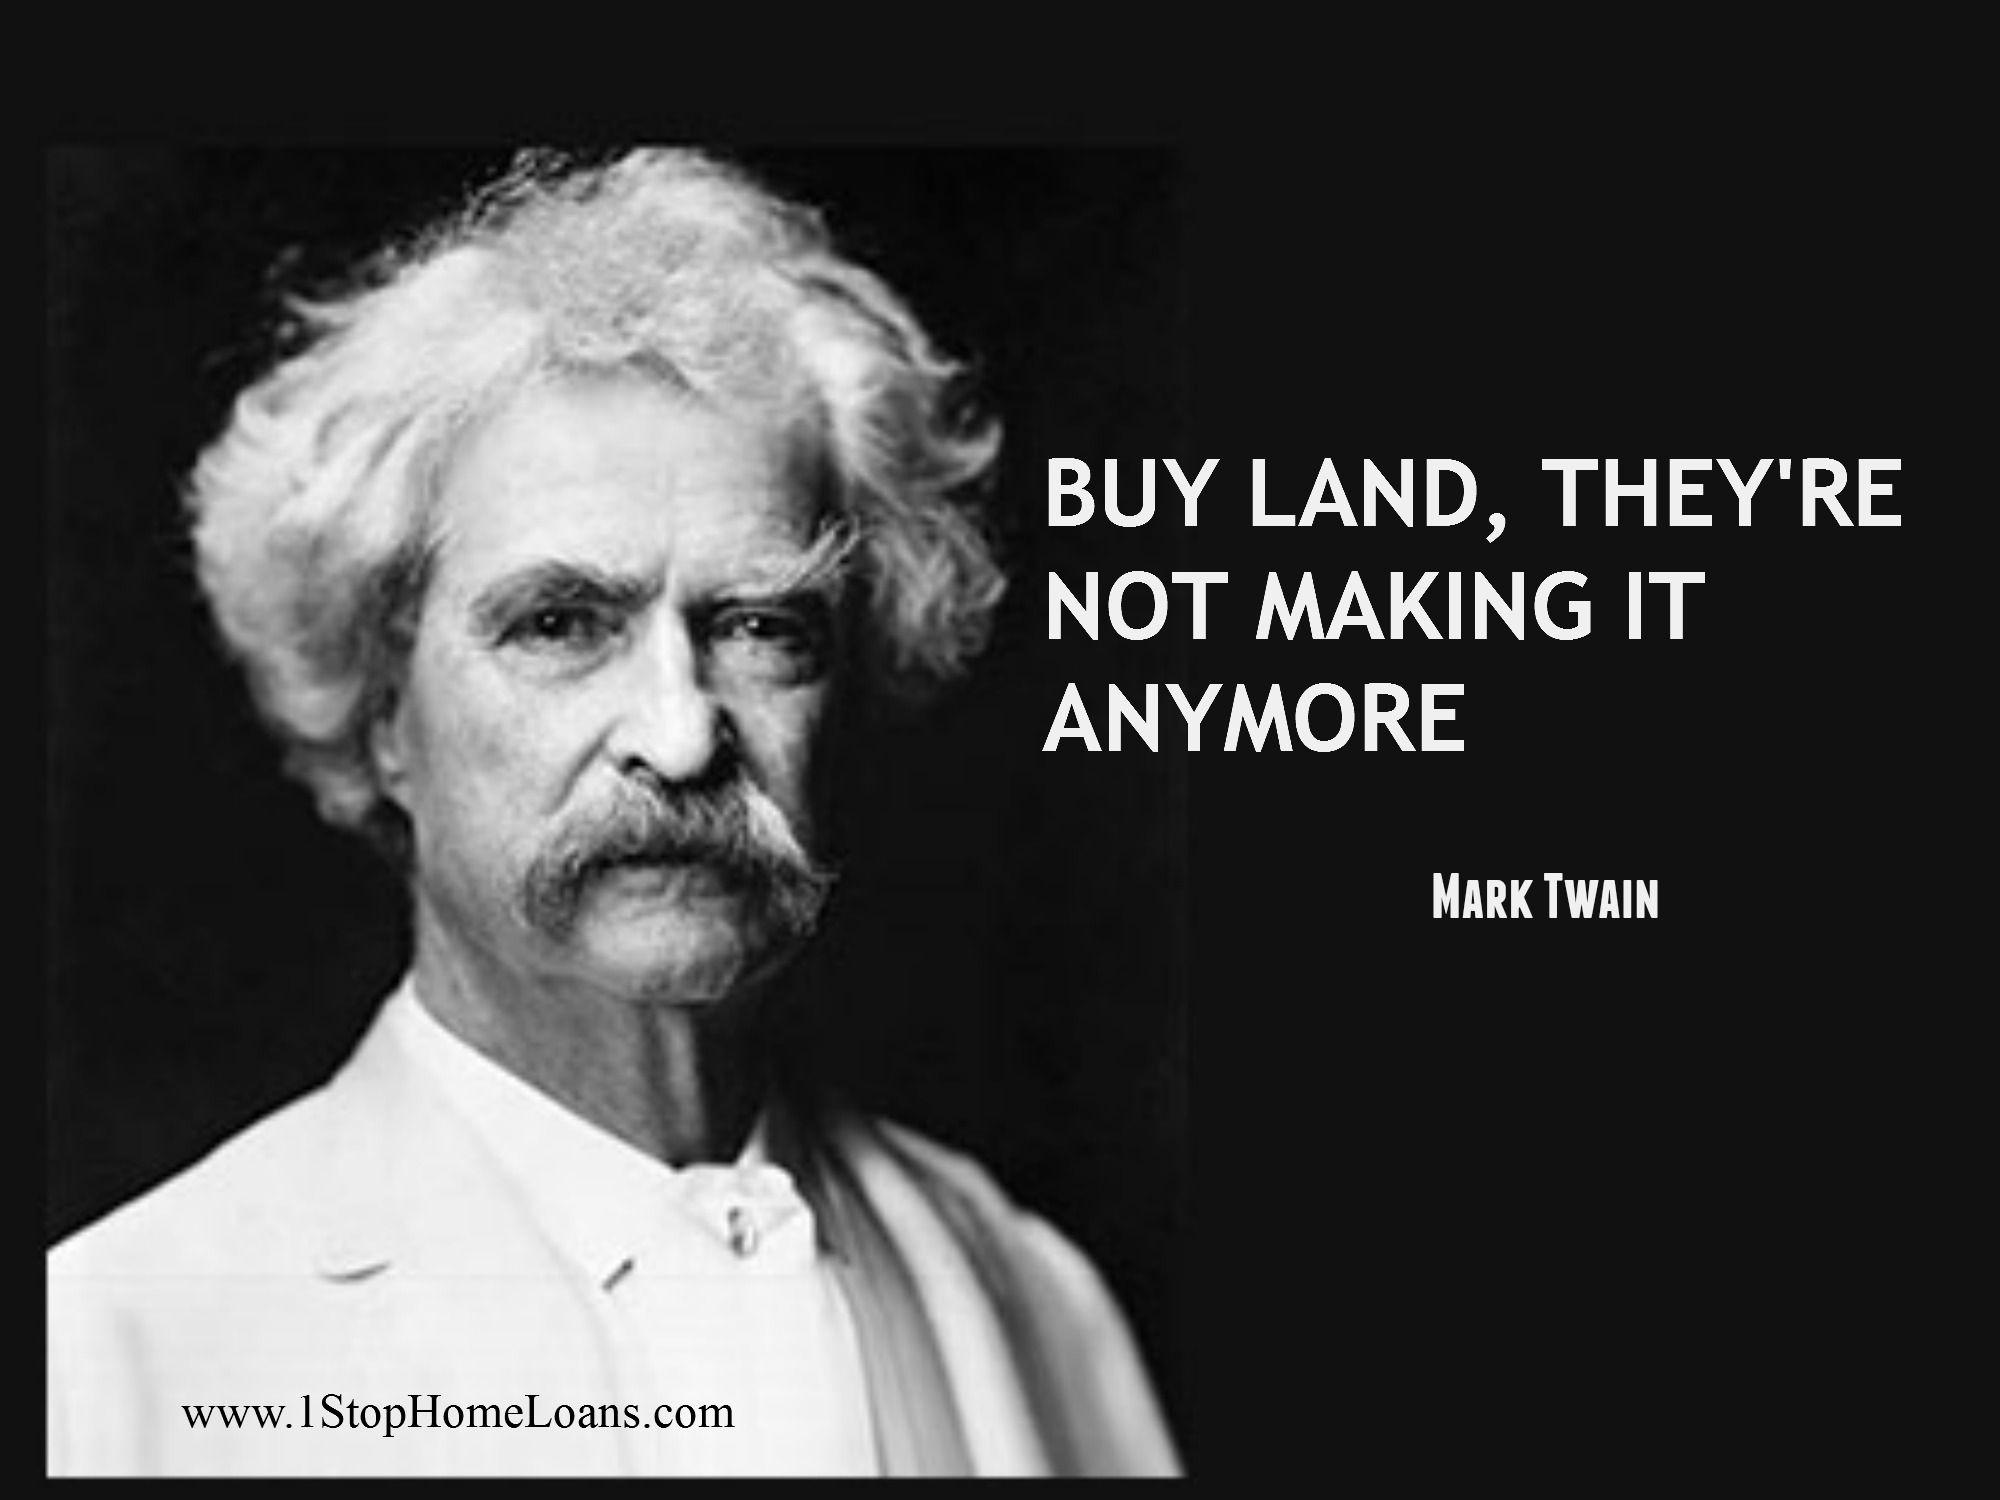 Mark Twain Quote Mark_Twain Mark twain quotes